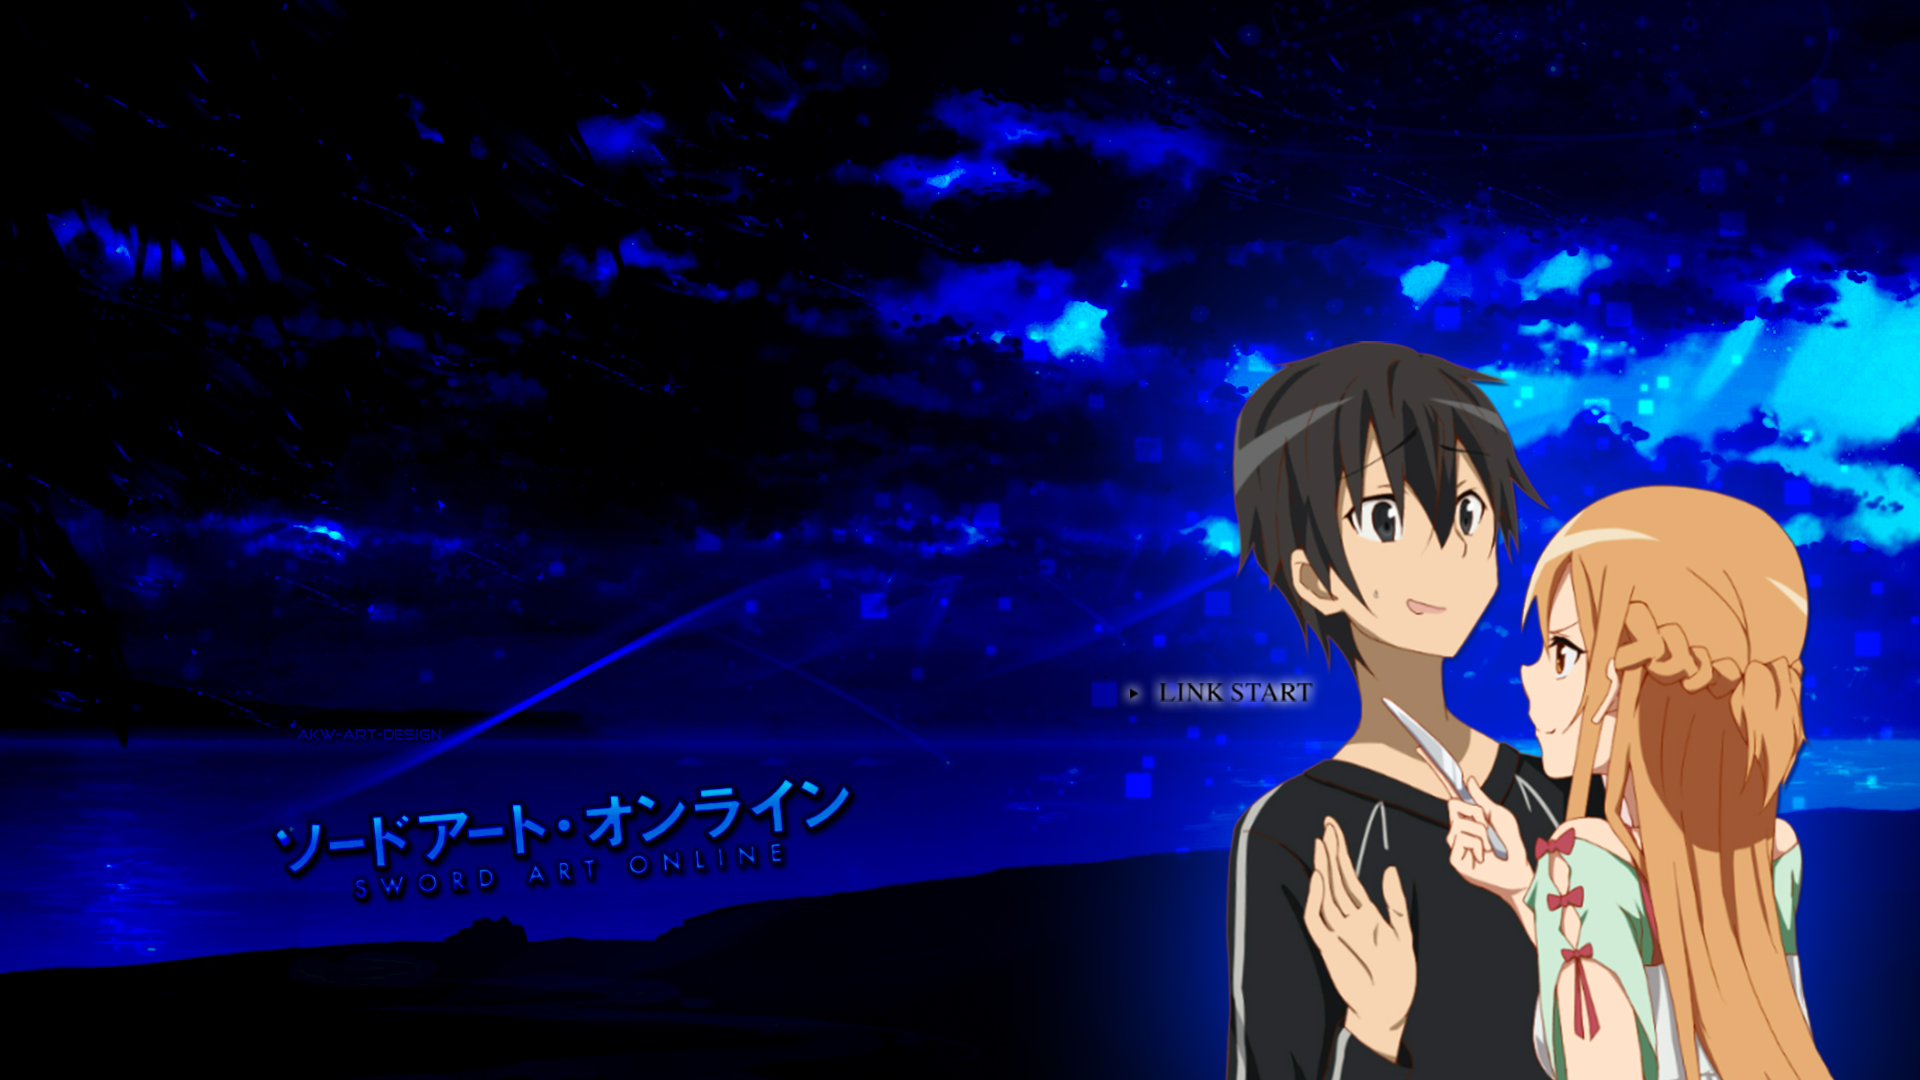 Sword Art Online - Kirito x Asuna by Akw-Art-Design